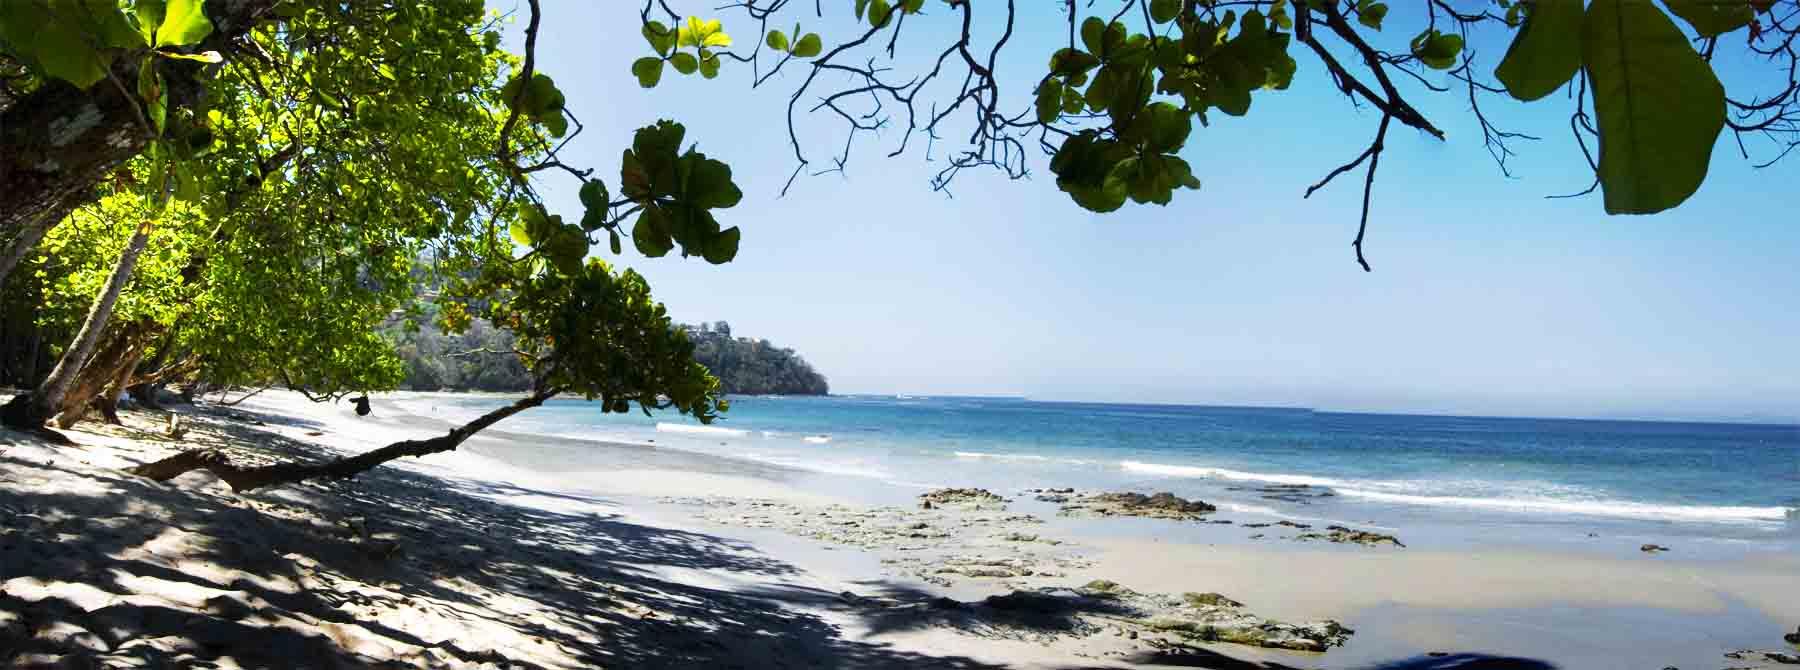 PhotoFly Travel Club | Beaches in CR | PhotoFly Travel Club